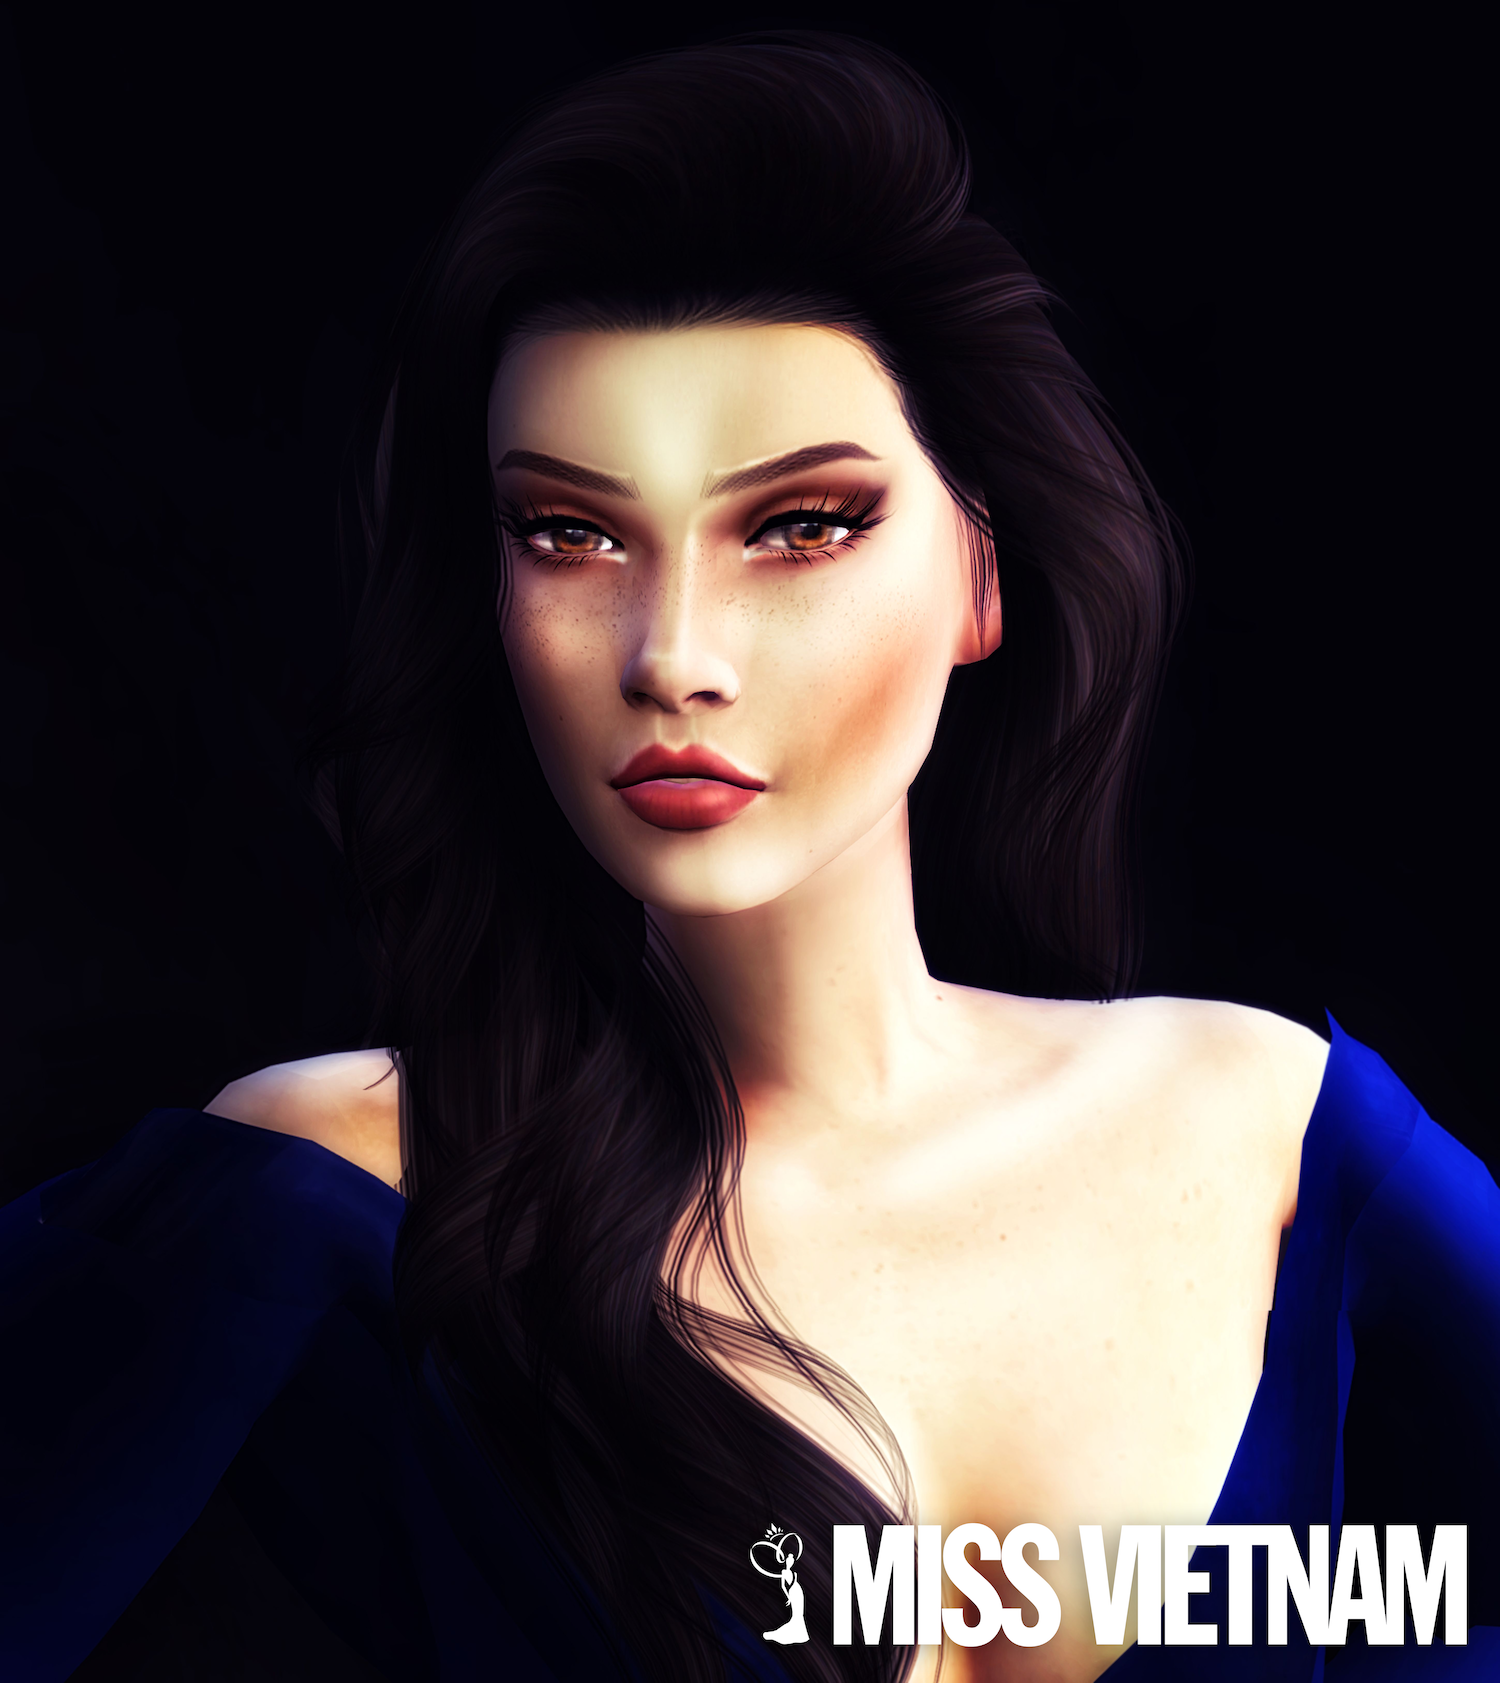 Promo-Miss-Vietnam.png